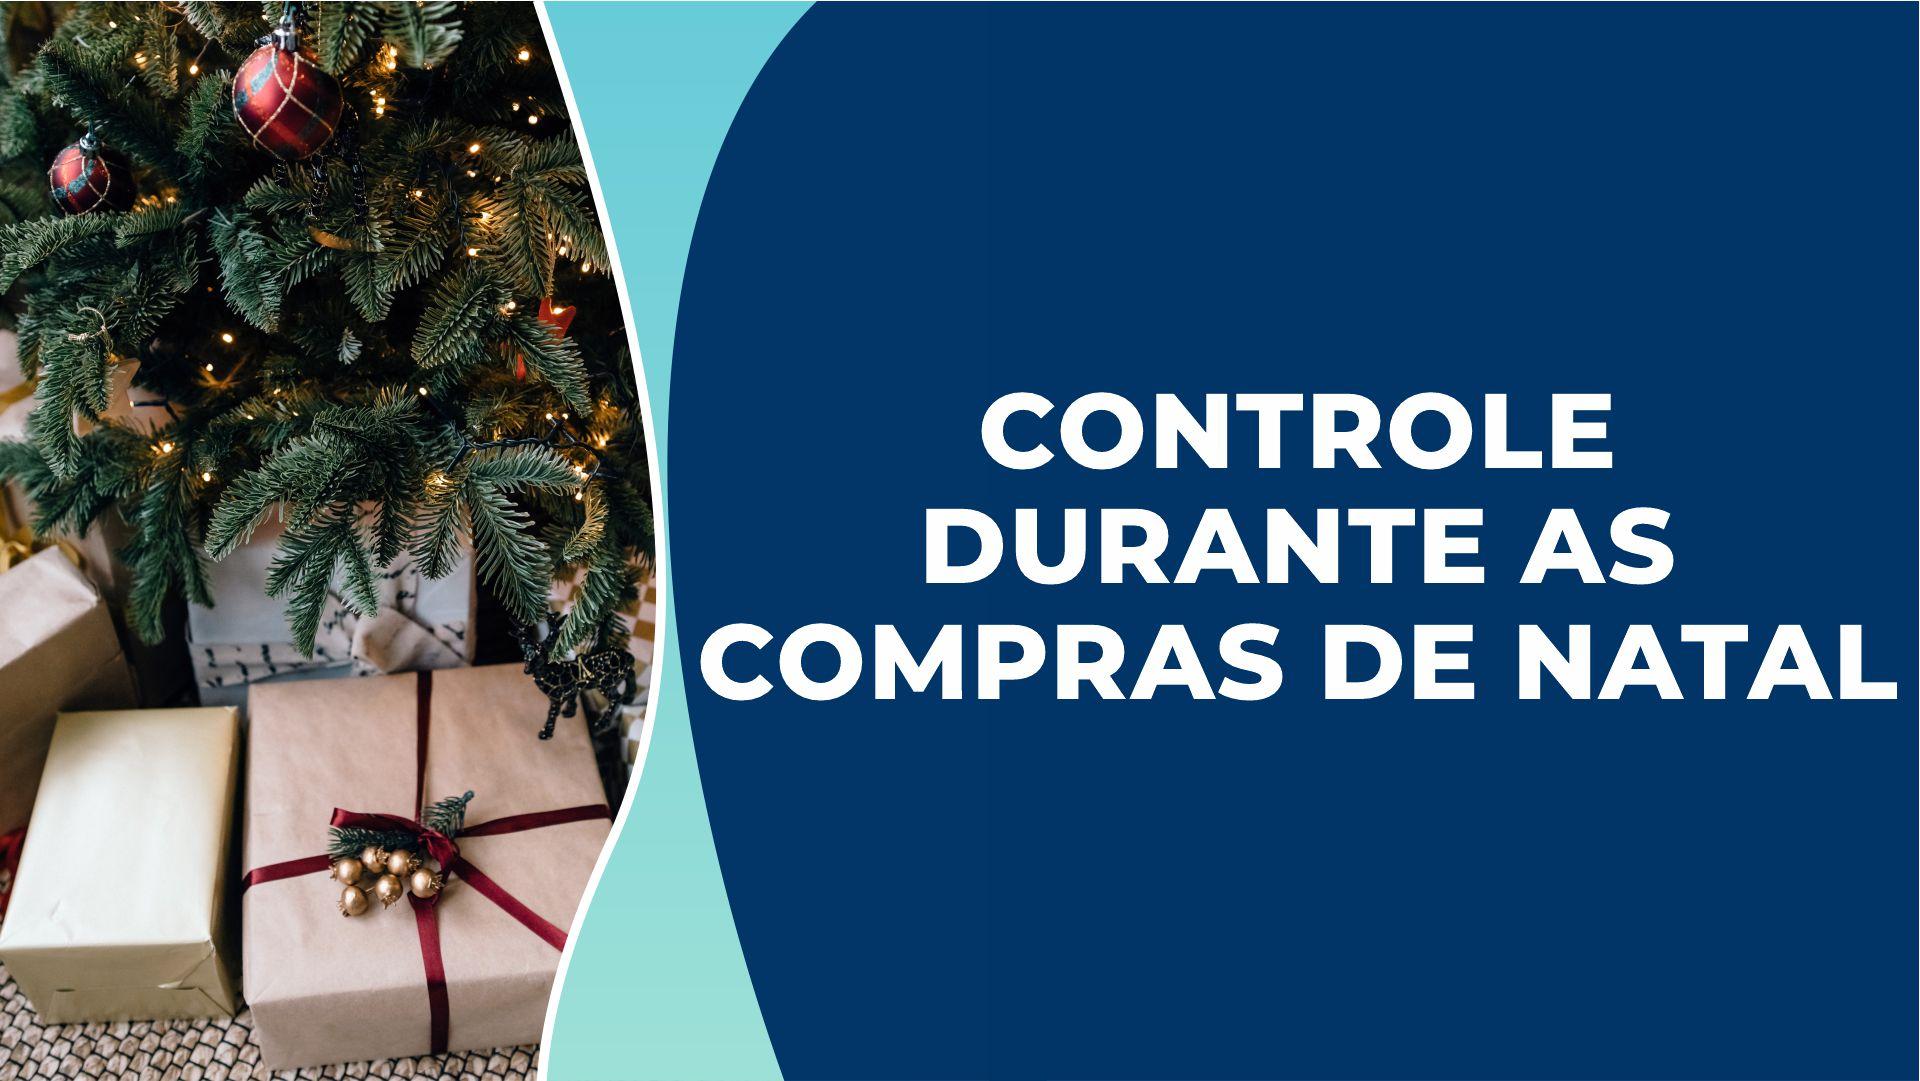 Controle durante as compras de Natal – Como otimizar o orçamento?